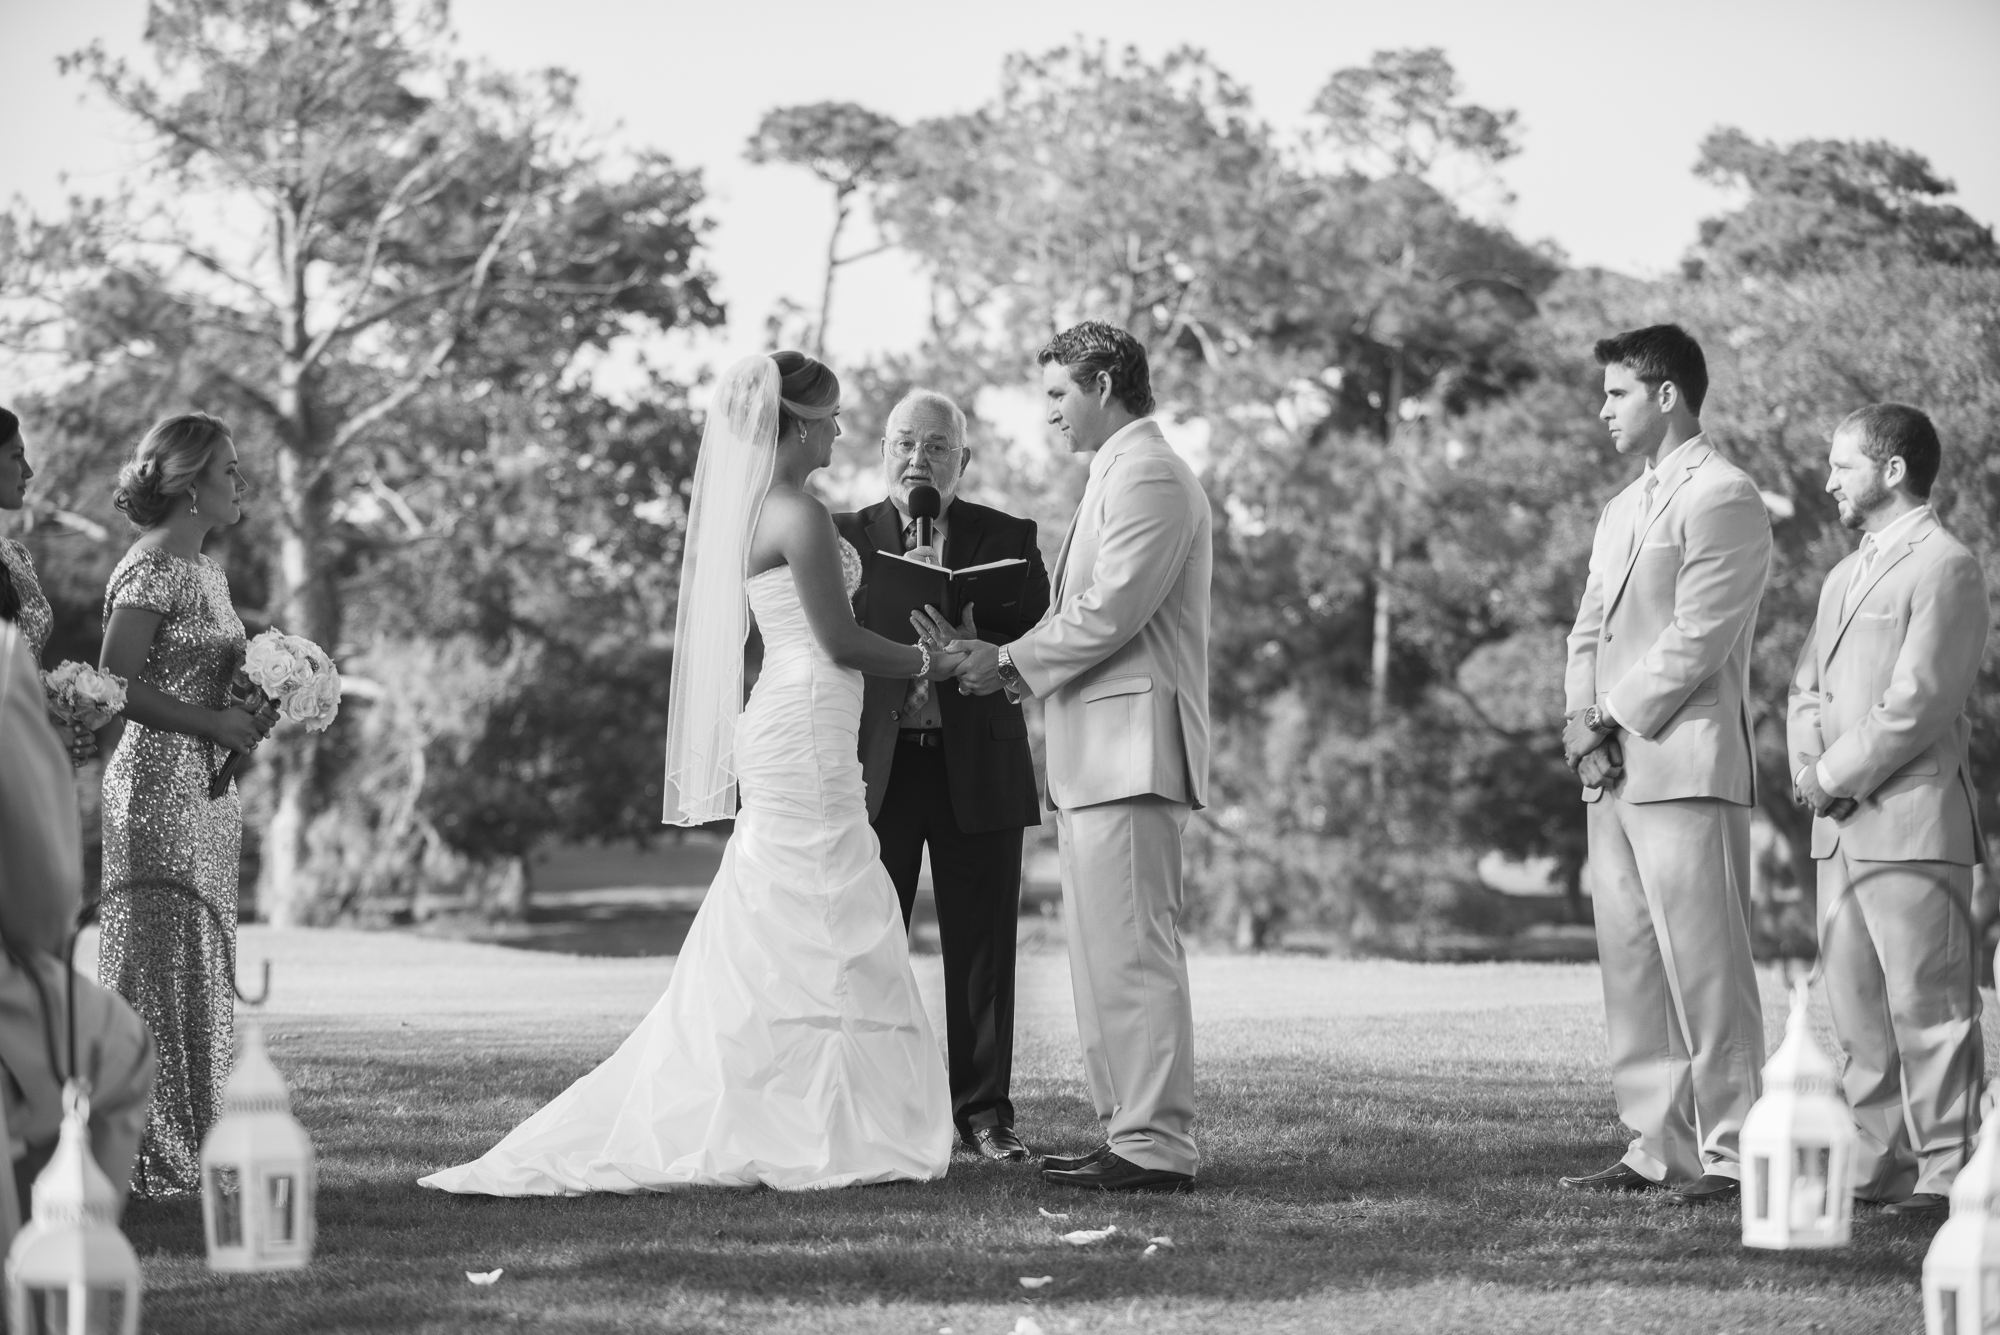 Heather-Chris-wedding-blog-16.jpg